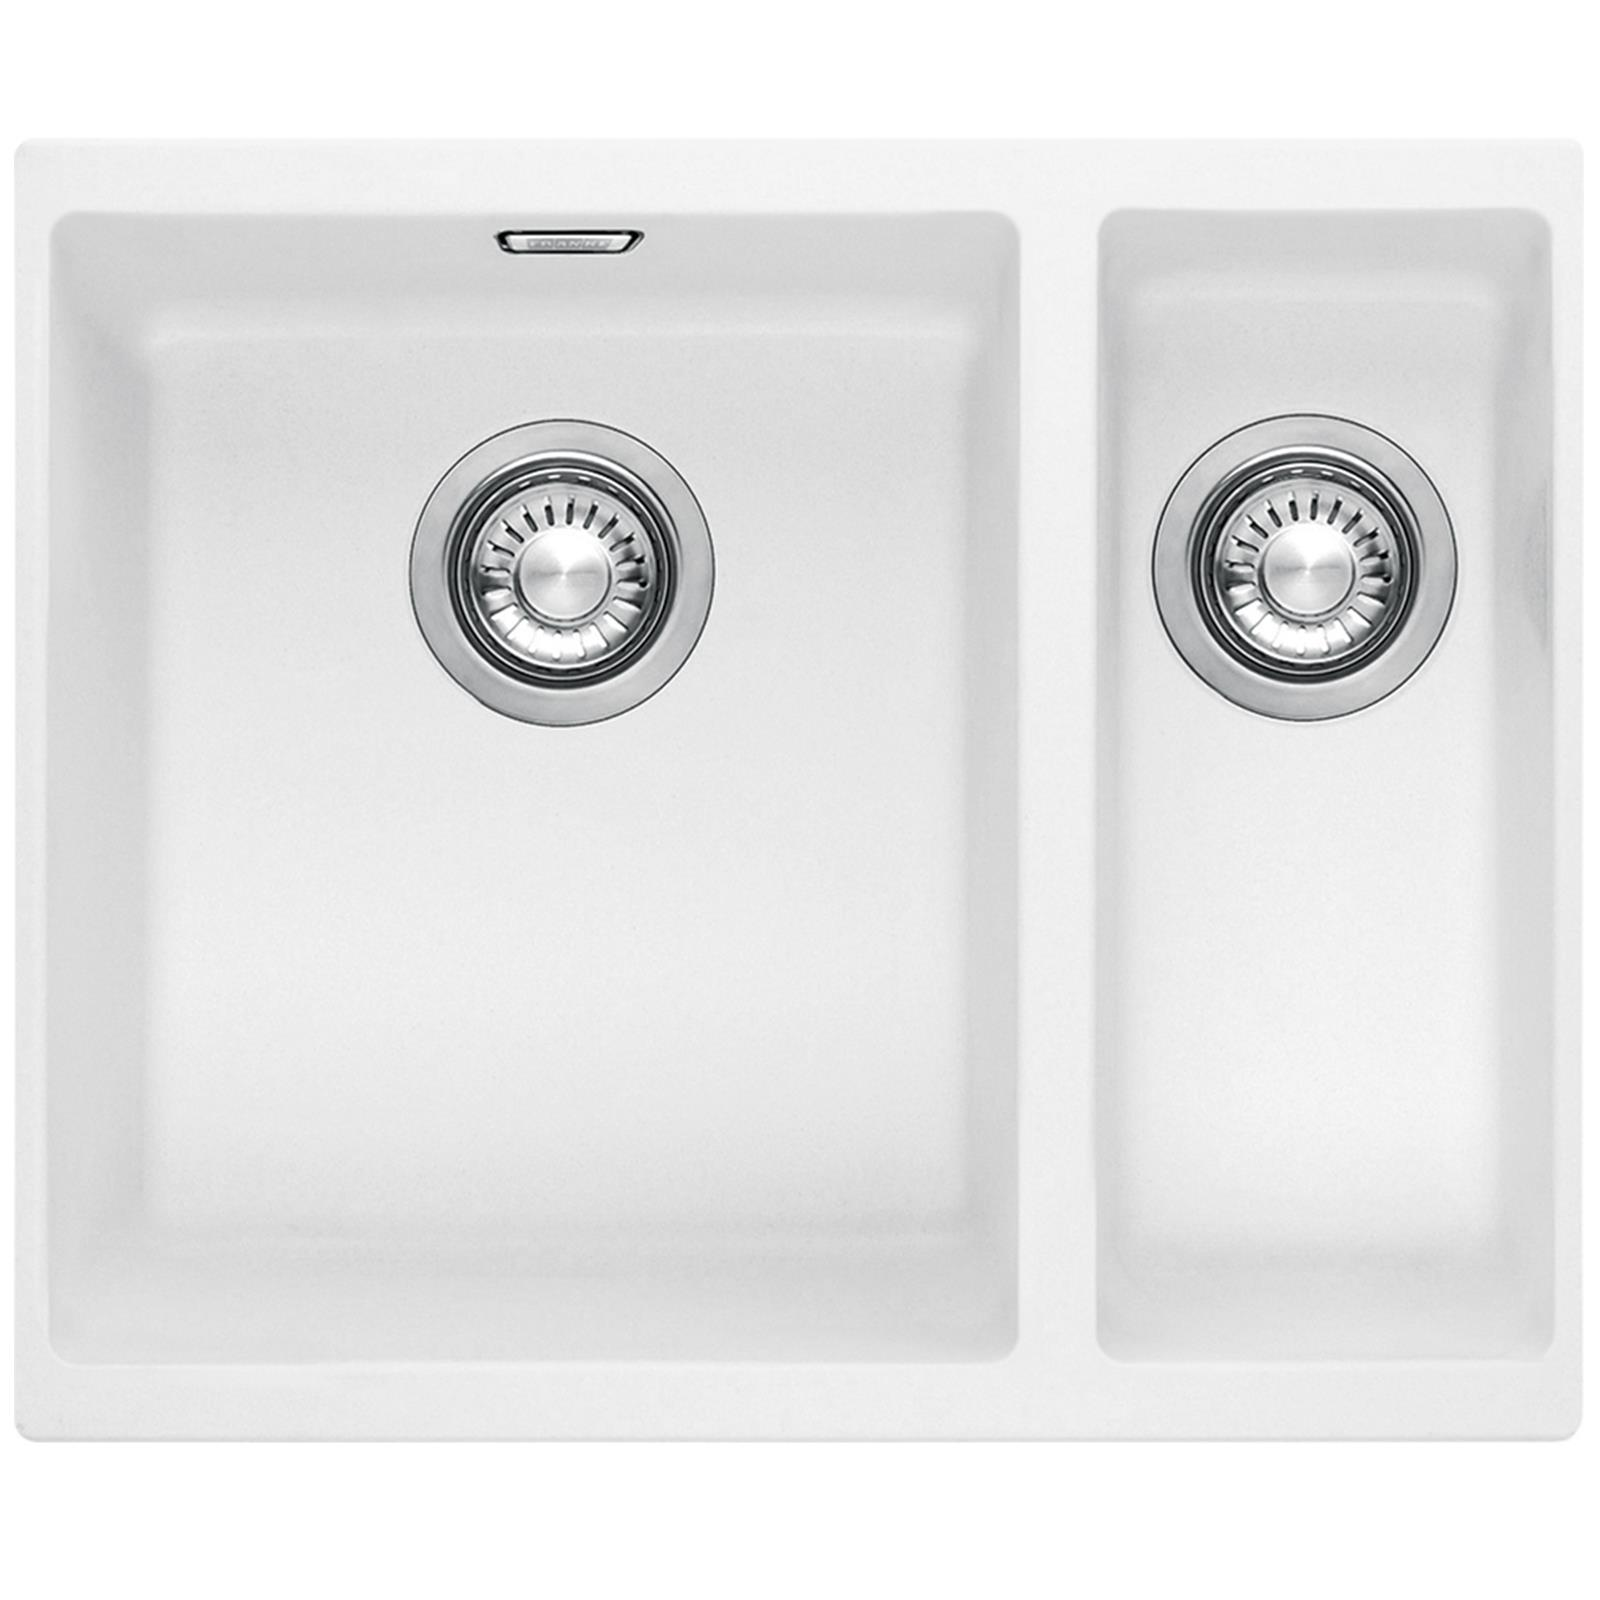 Image of: Franke Sid 160 1 5 Bowl Polar White Tectonite Undermount Kitchen Sink And Waste 7612980799978 Ebay